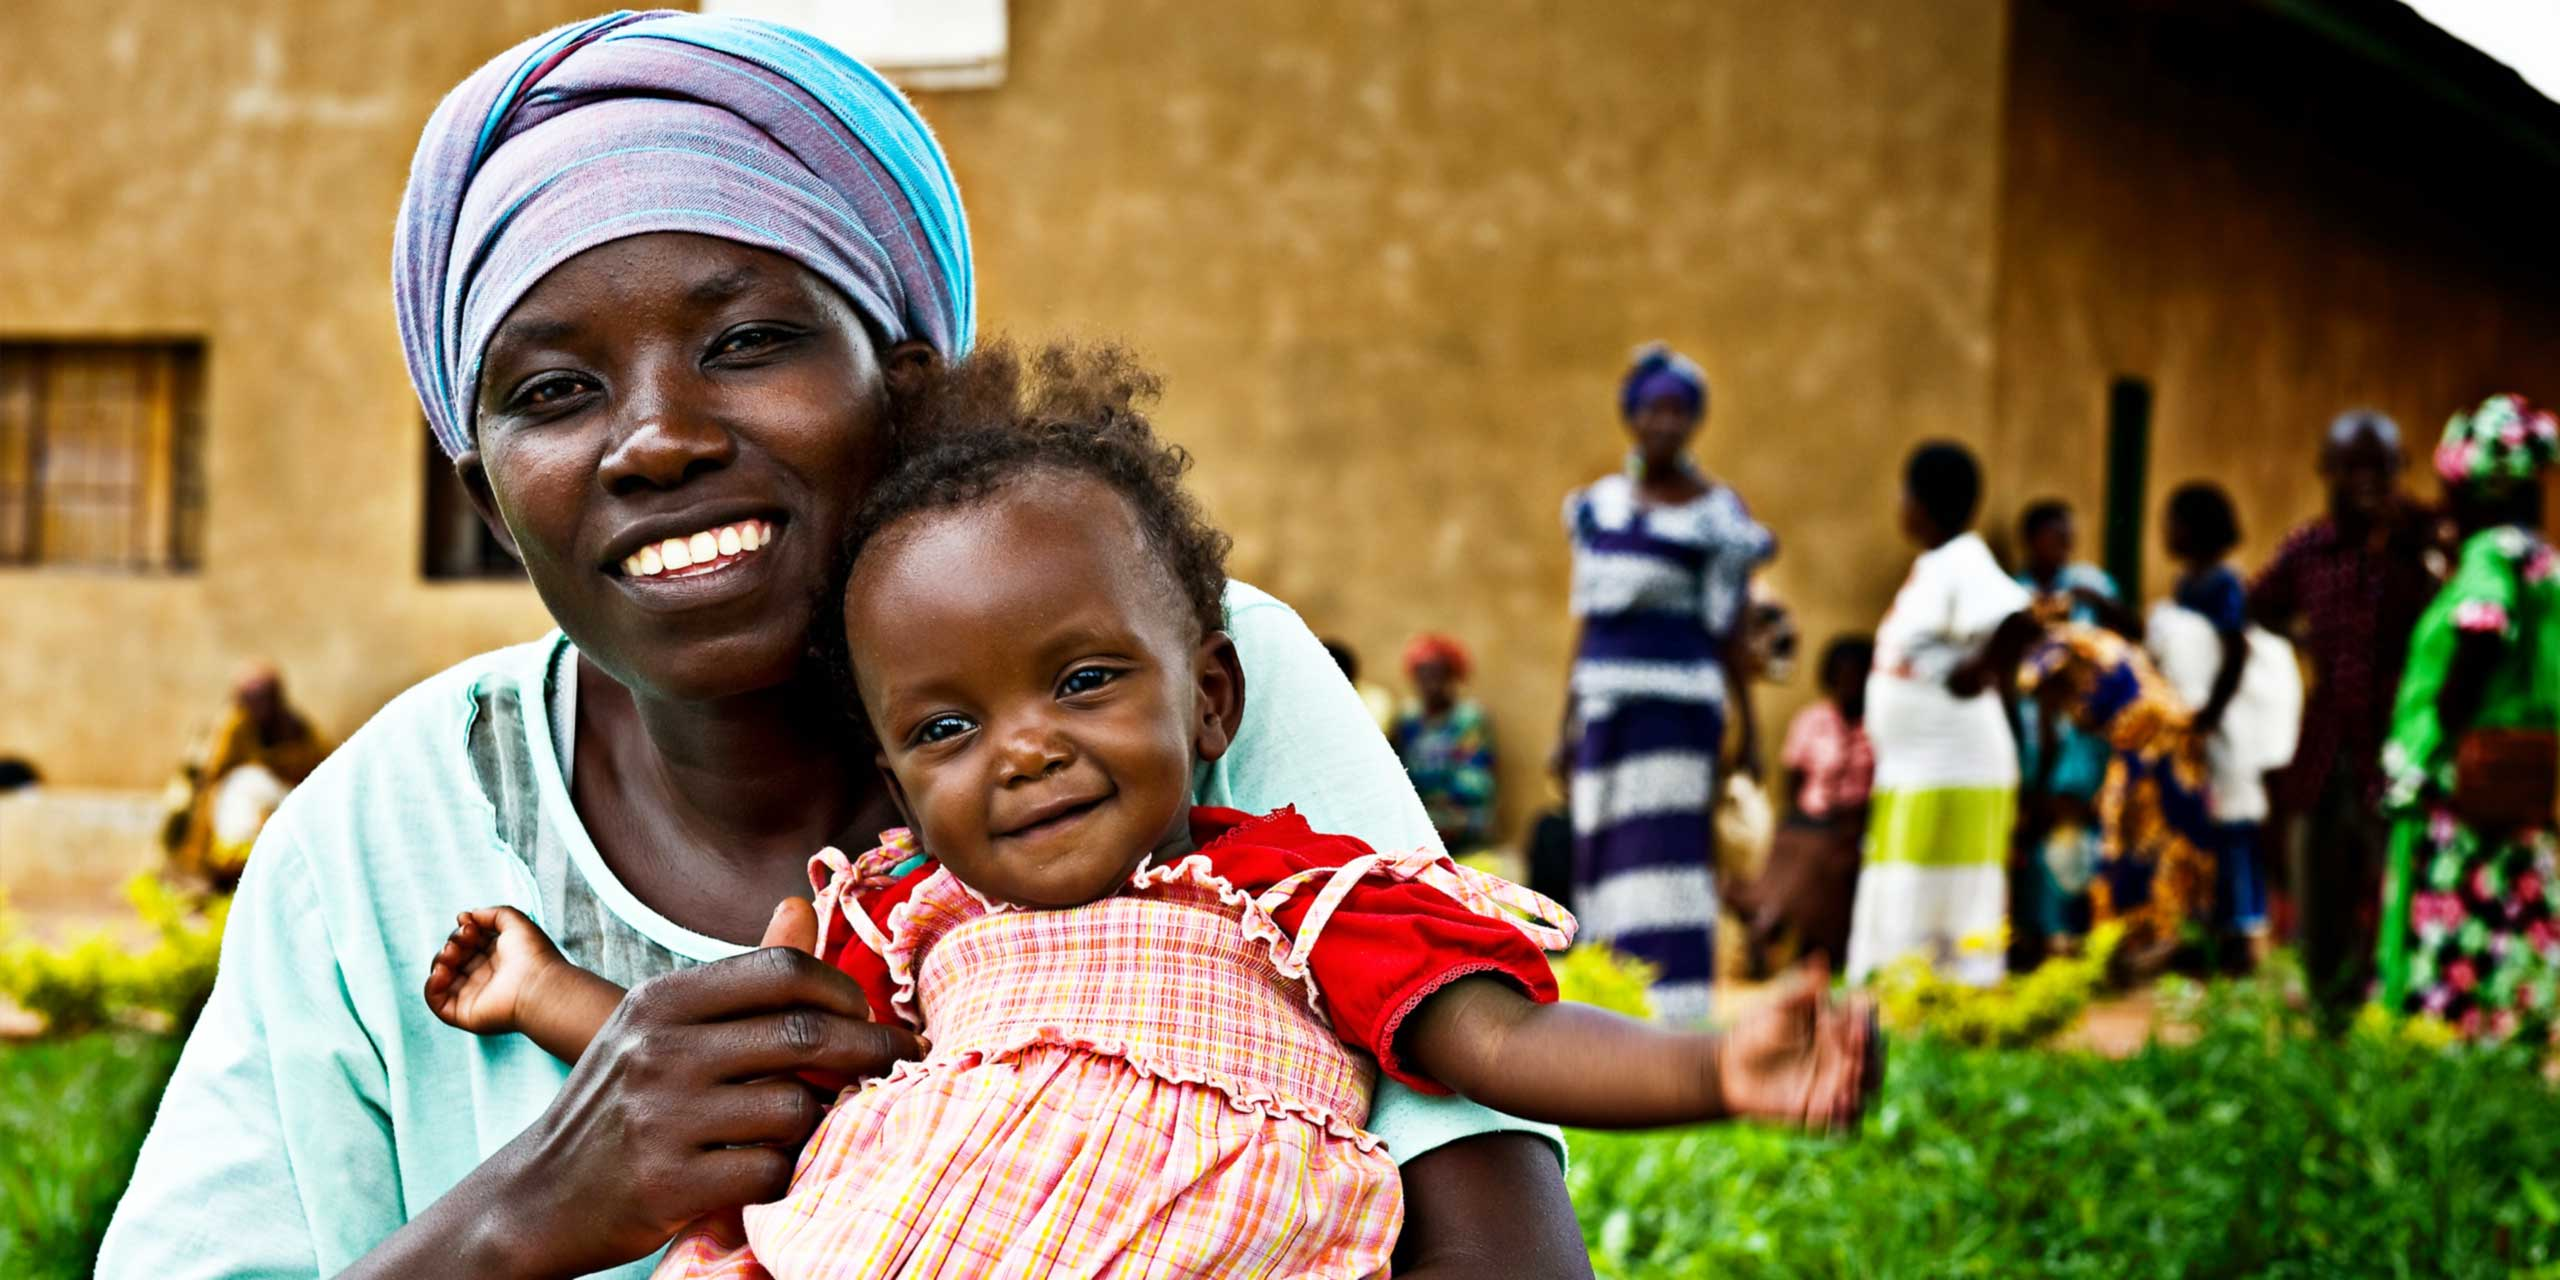 http://skollworldforumorg.c.presscdn.com/wp-content/uploads/2014/03/mothers2mothers-sl4.jpg